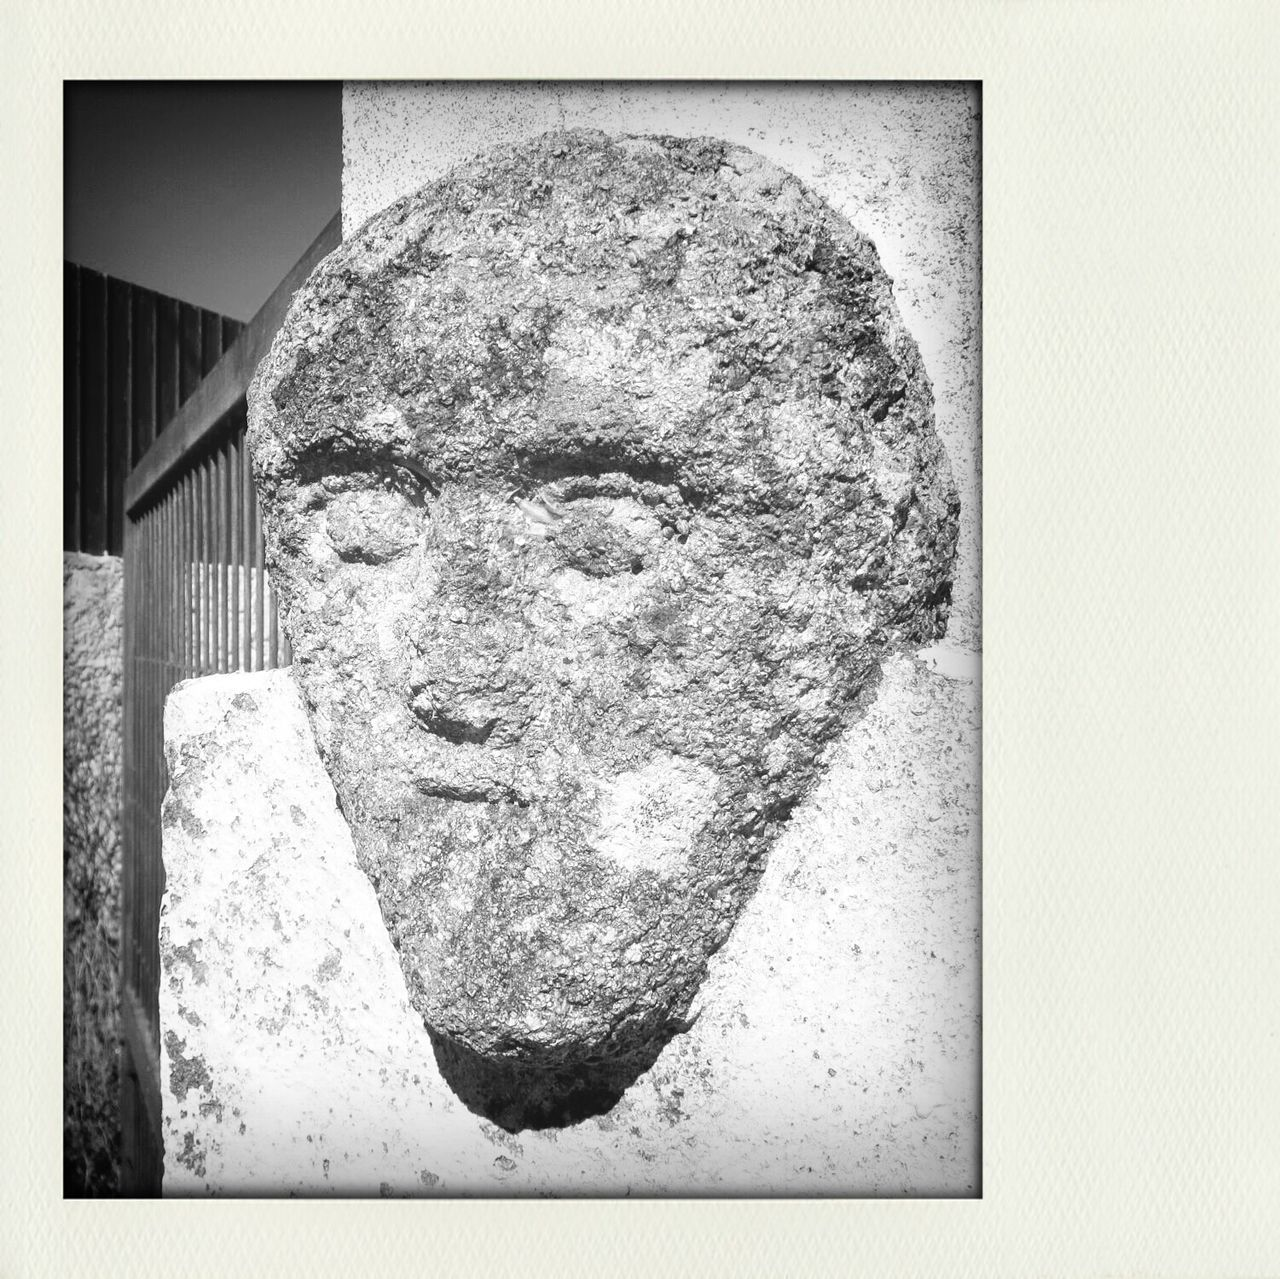 A Stone Face :-) My Monochrome World Monochrome _ Collection Eyeem Monochrome Black And Light